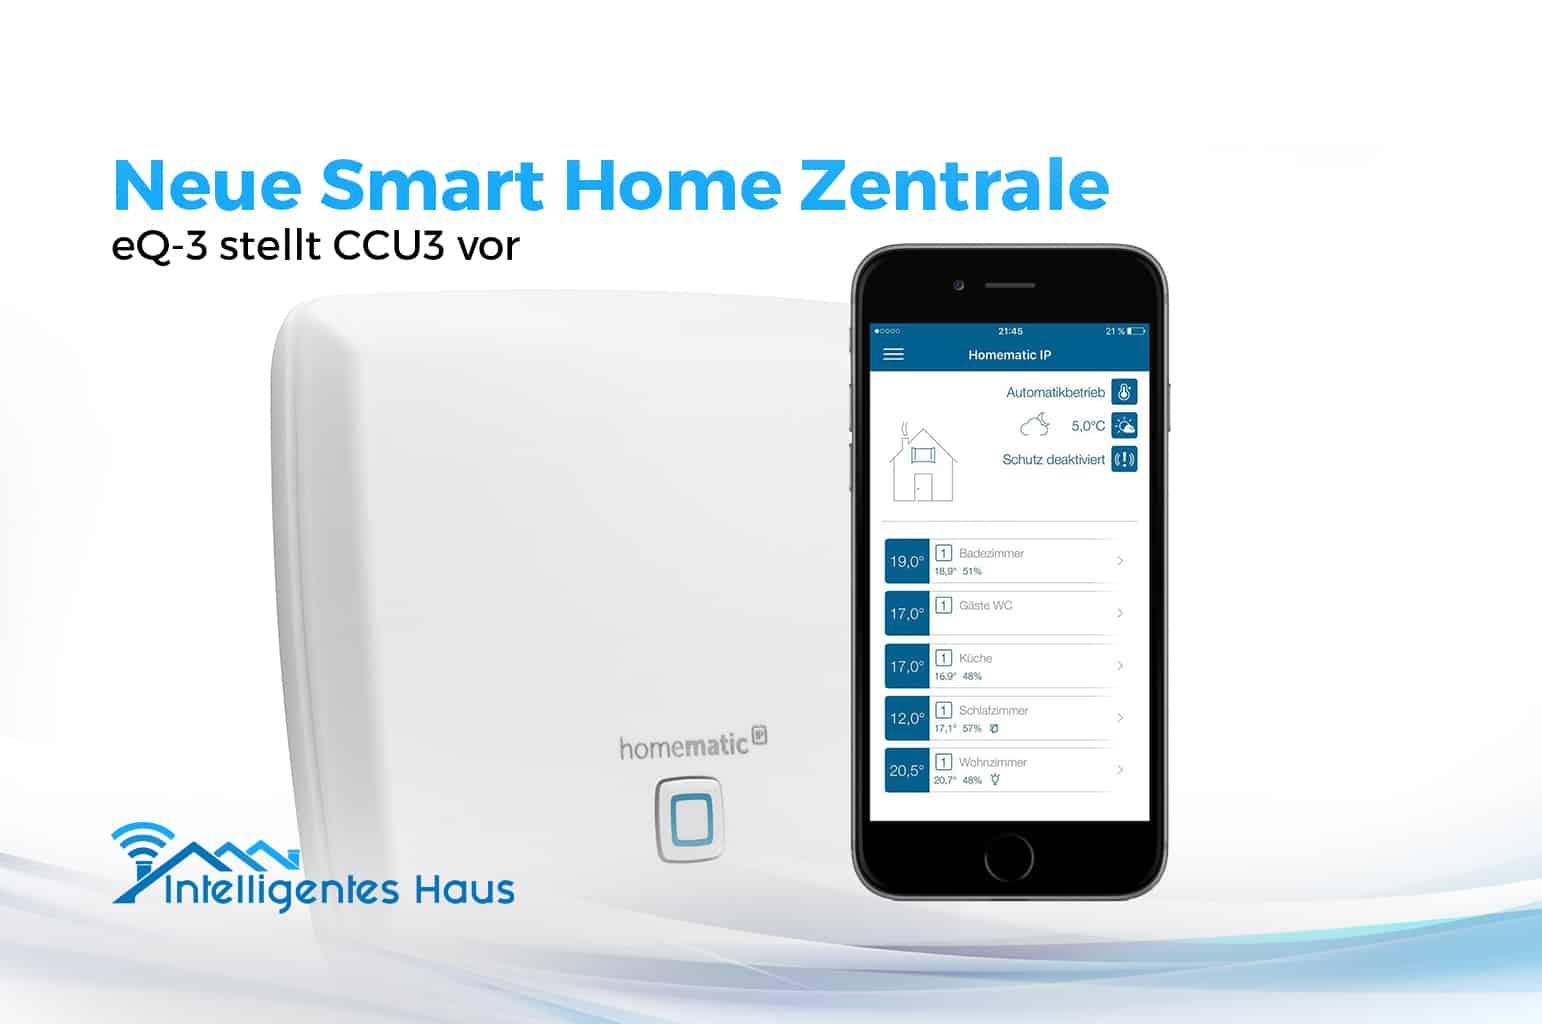 homematic ip wired kabelgebundene smart home zentrale ccu3. Black Bedroom Furniture Sets. Home Design Ideas